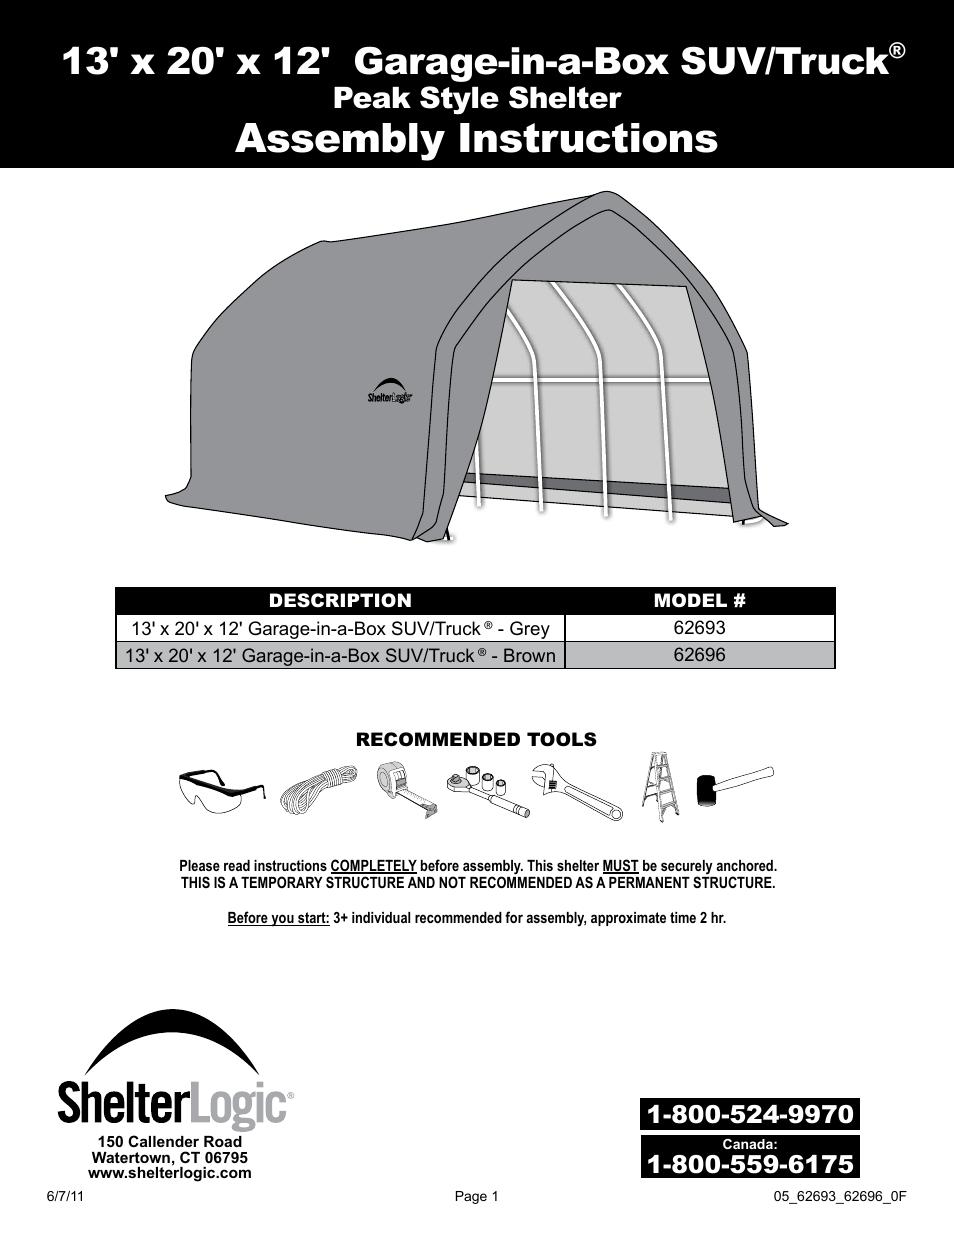 shelterlogic 62696 13 x 20 x 12 garage in a box suv truck user rh manualsdir com Homelite Pressure Washer Ut80953b Assembly Manuals L Gz358pst 1 Assembly Manual